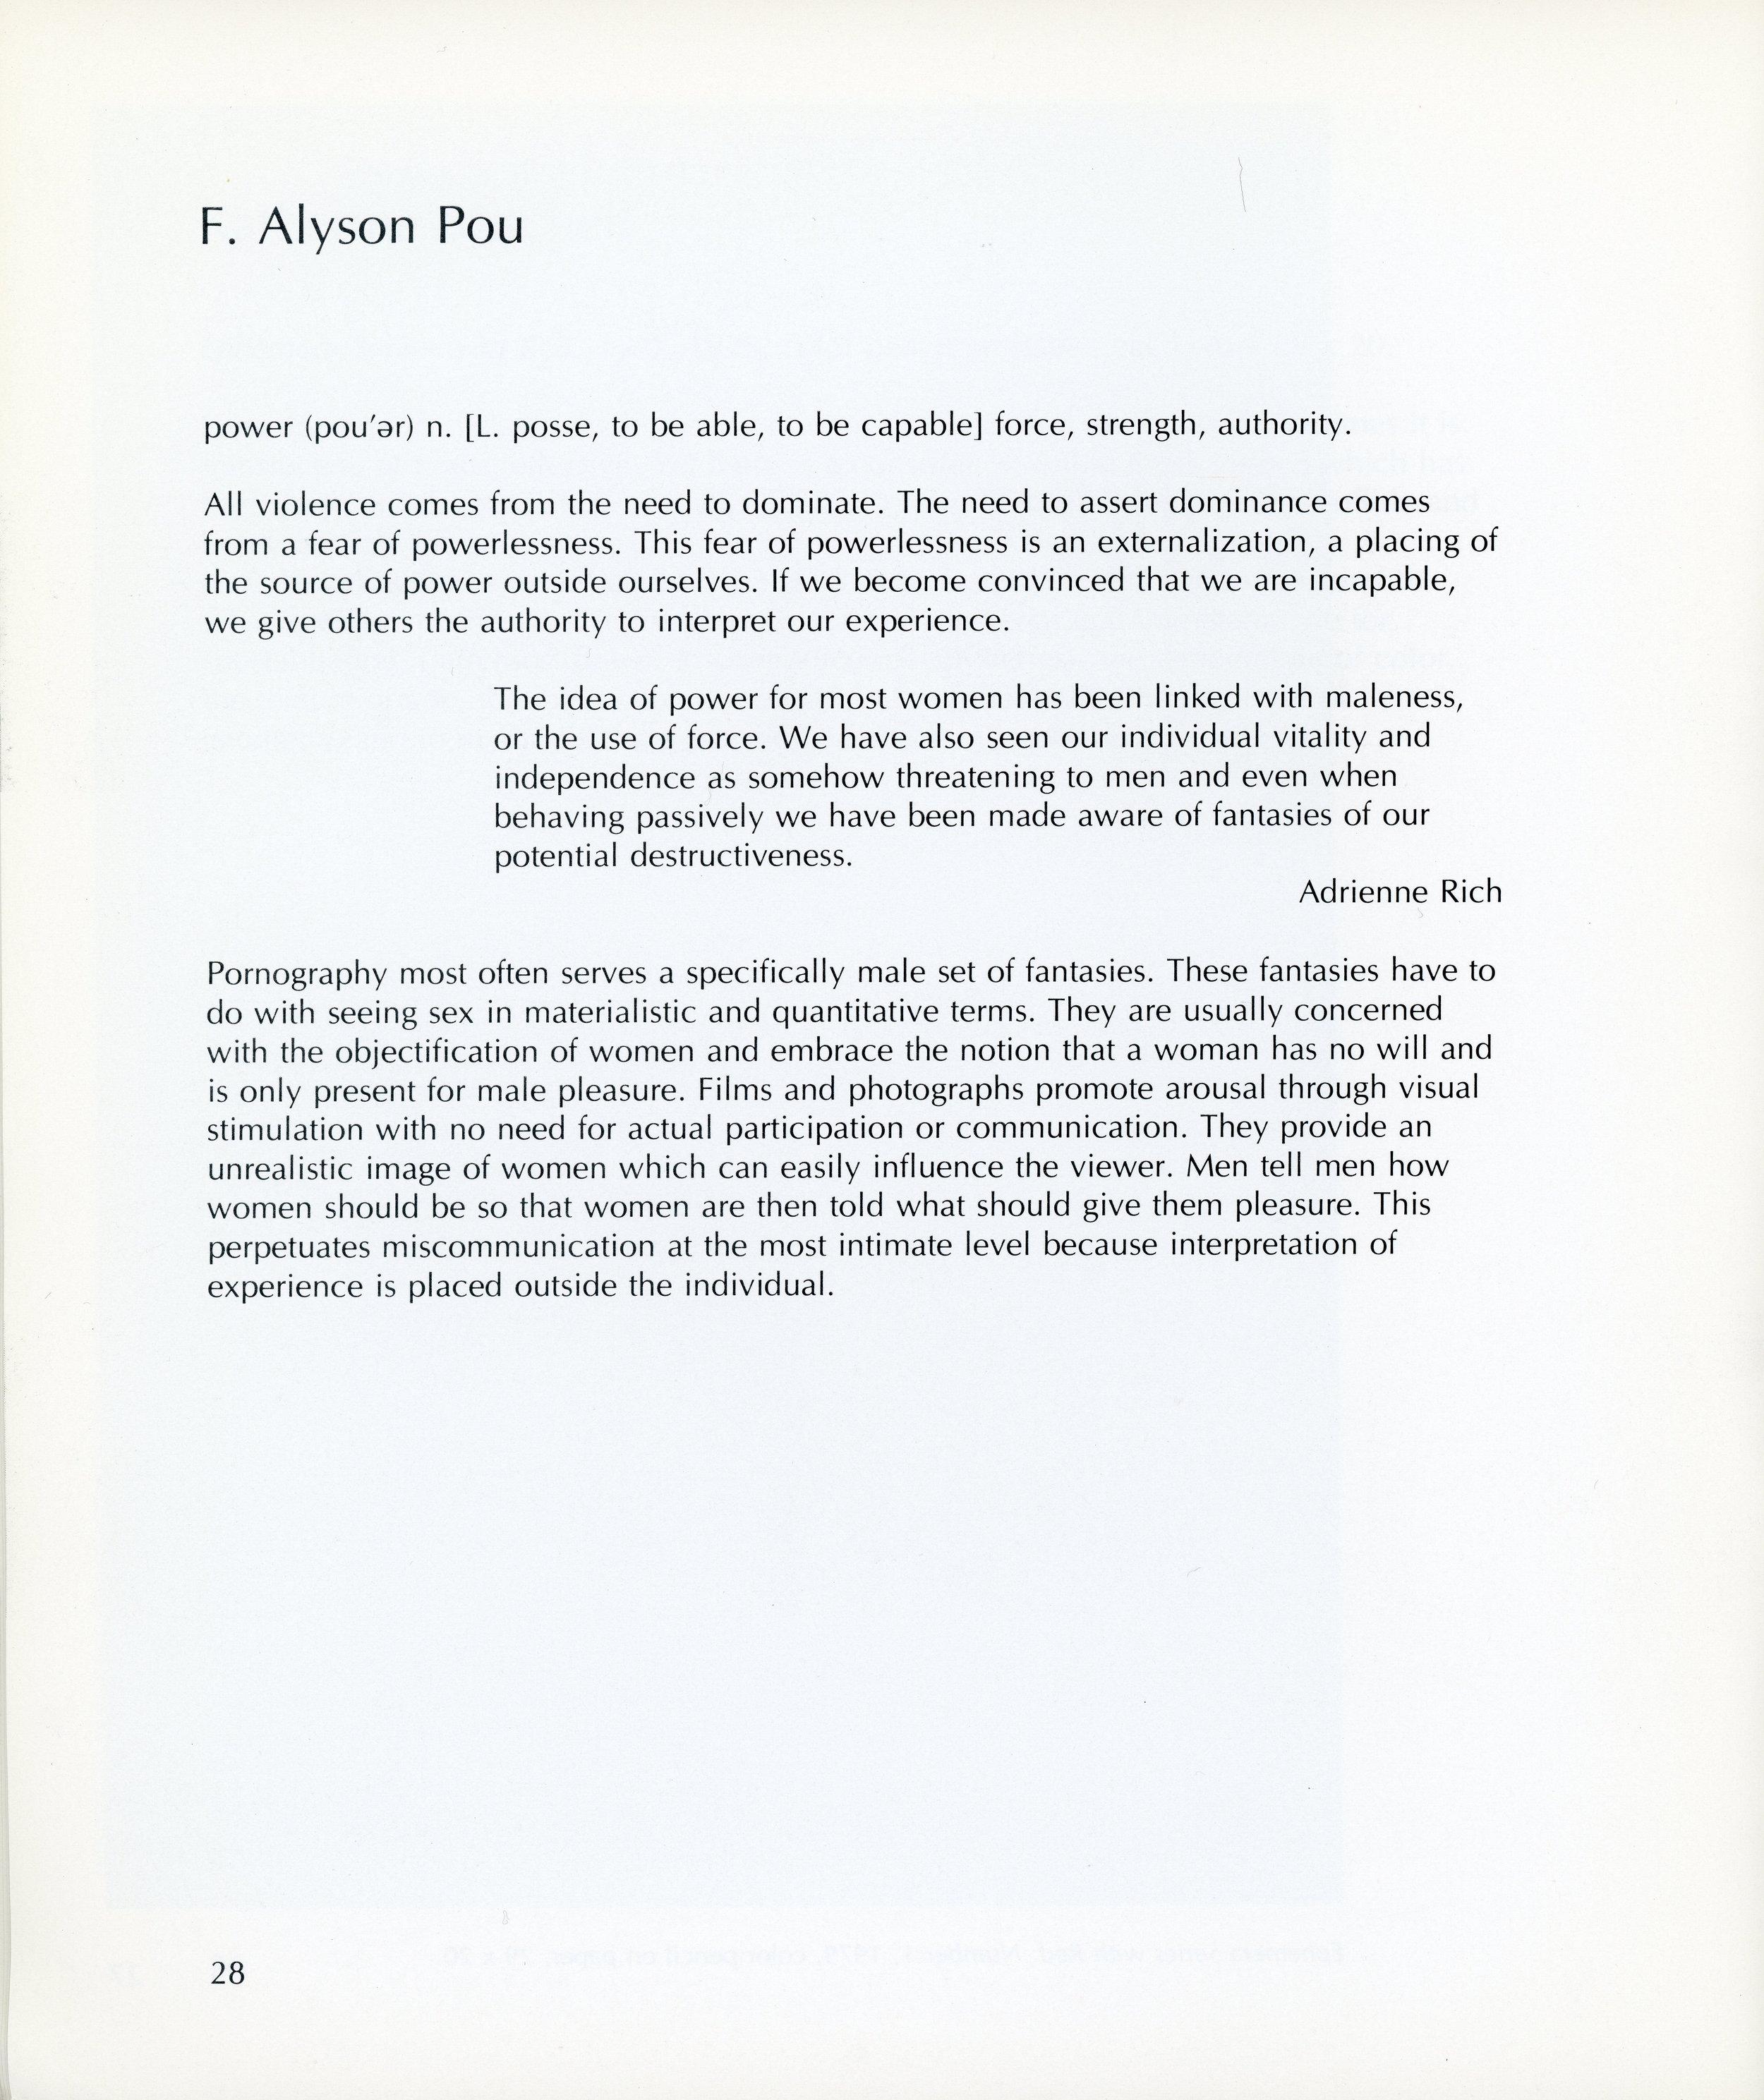 Power_project_statement_1979_pg1.jpg